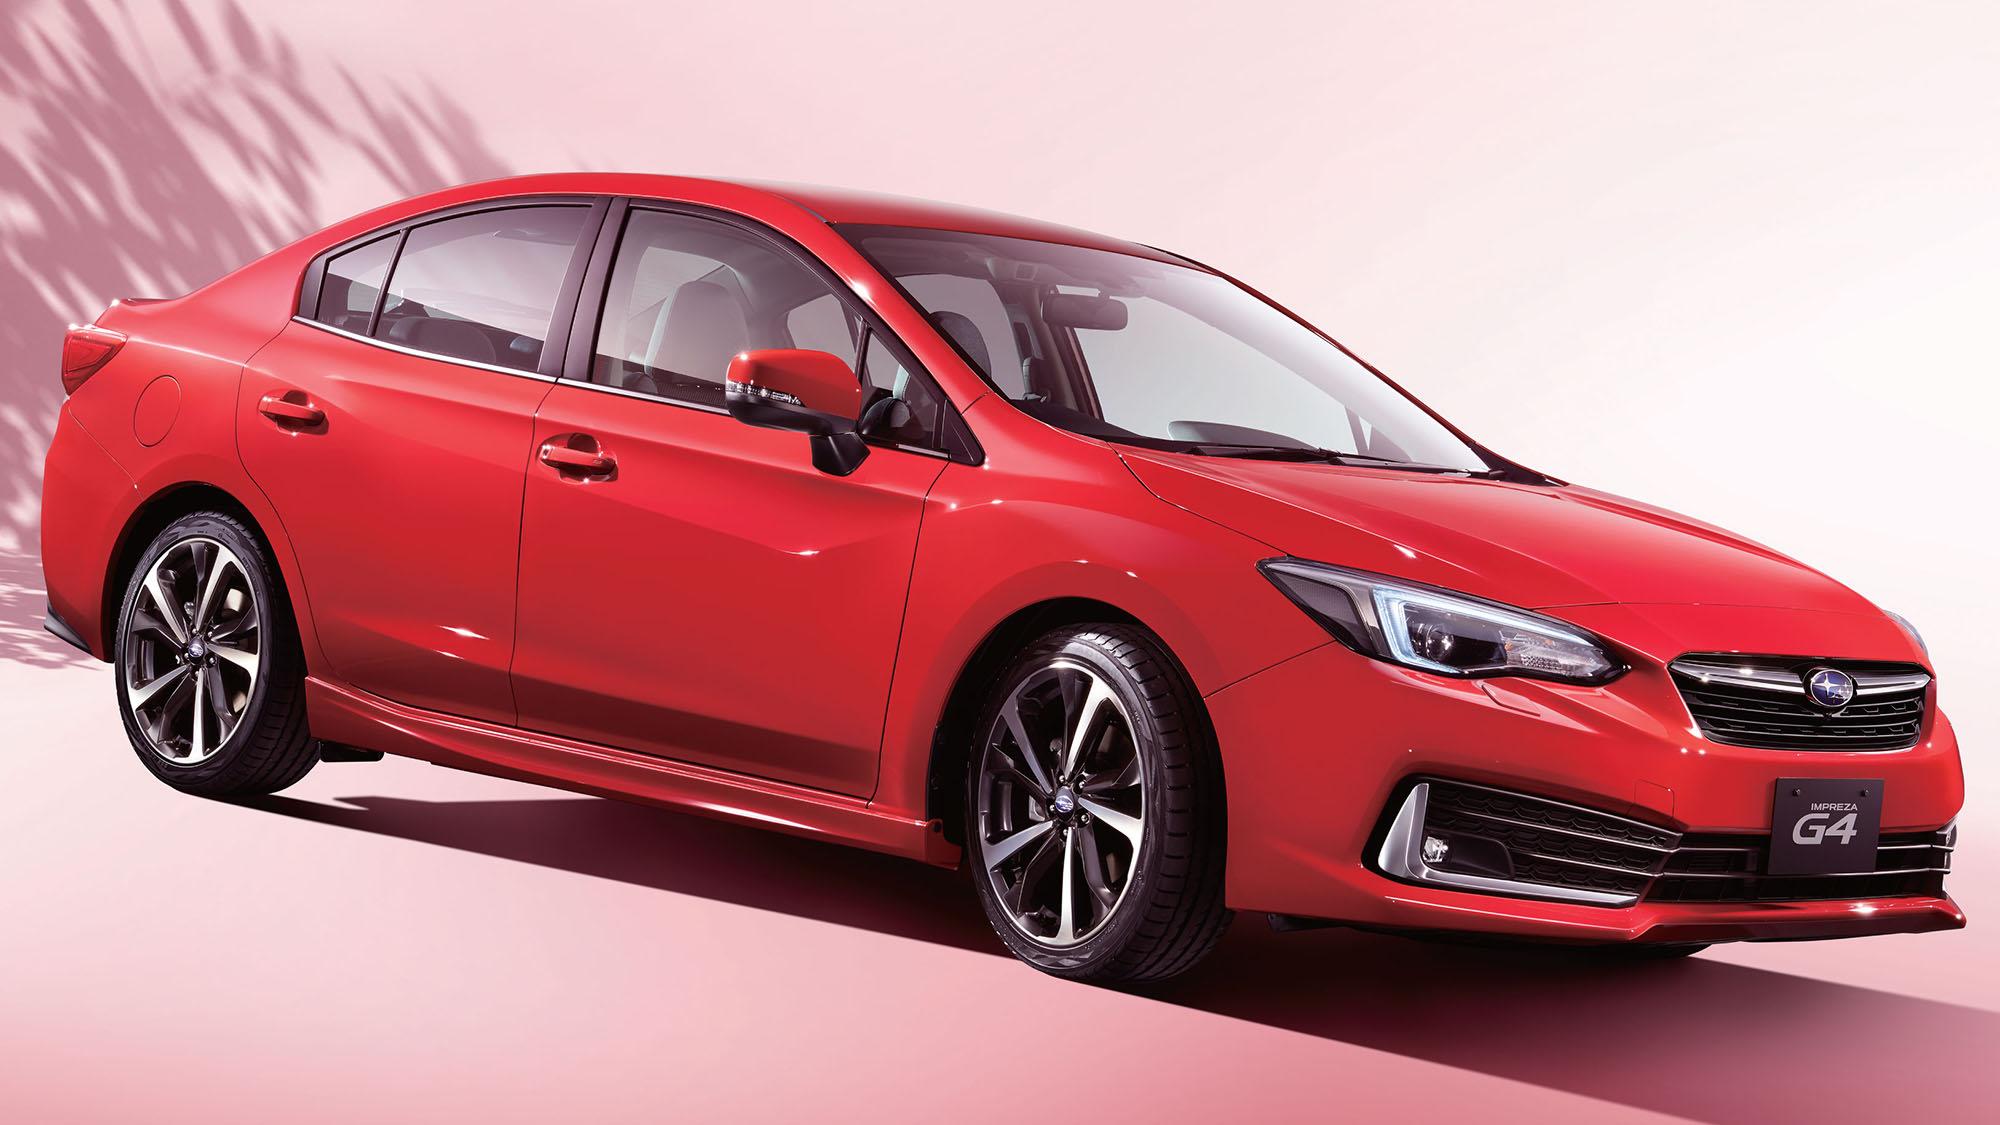 2020 Subaru Impreza Hatchback Review.2020 Subaru Impreza Facelift Unveiled In Japan Caradvice